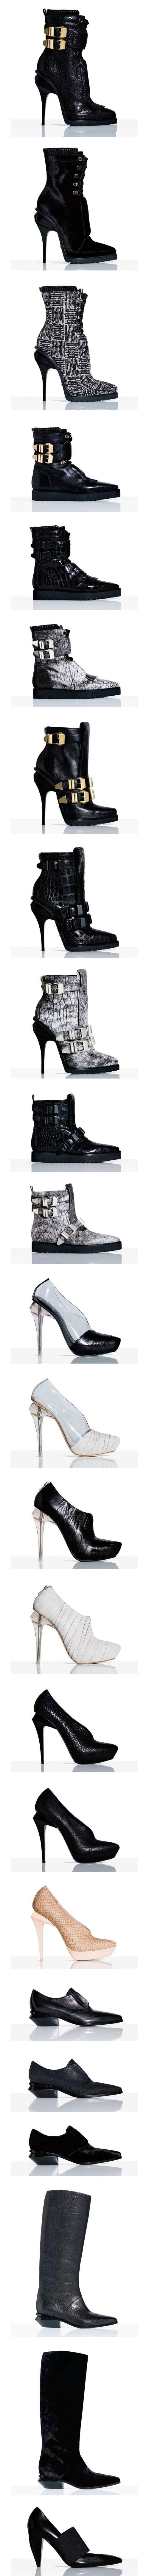 wangshoes09